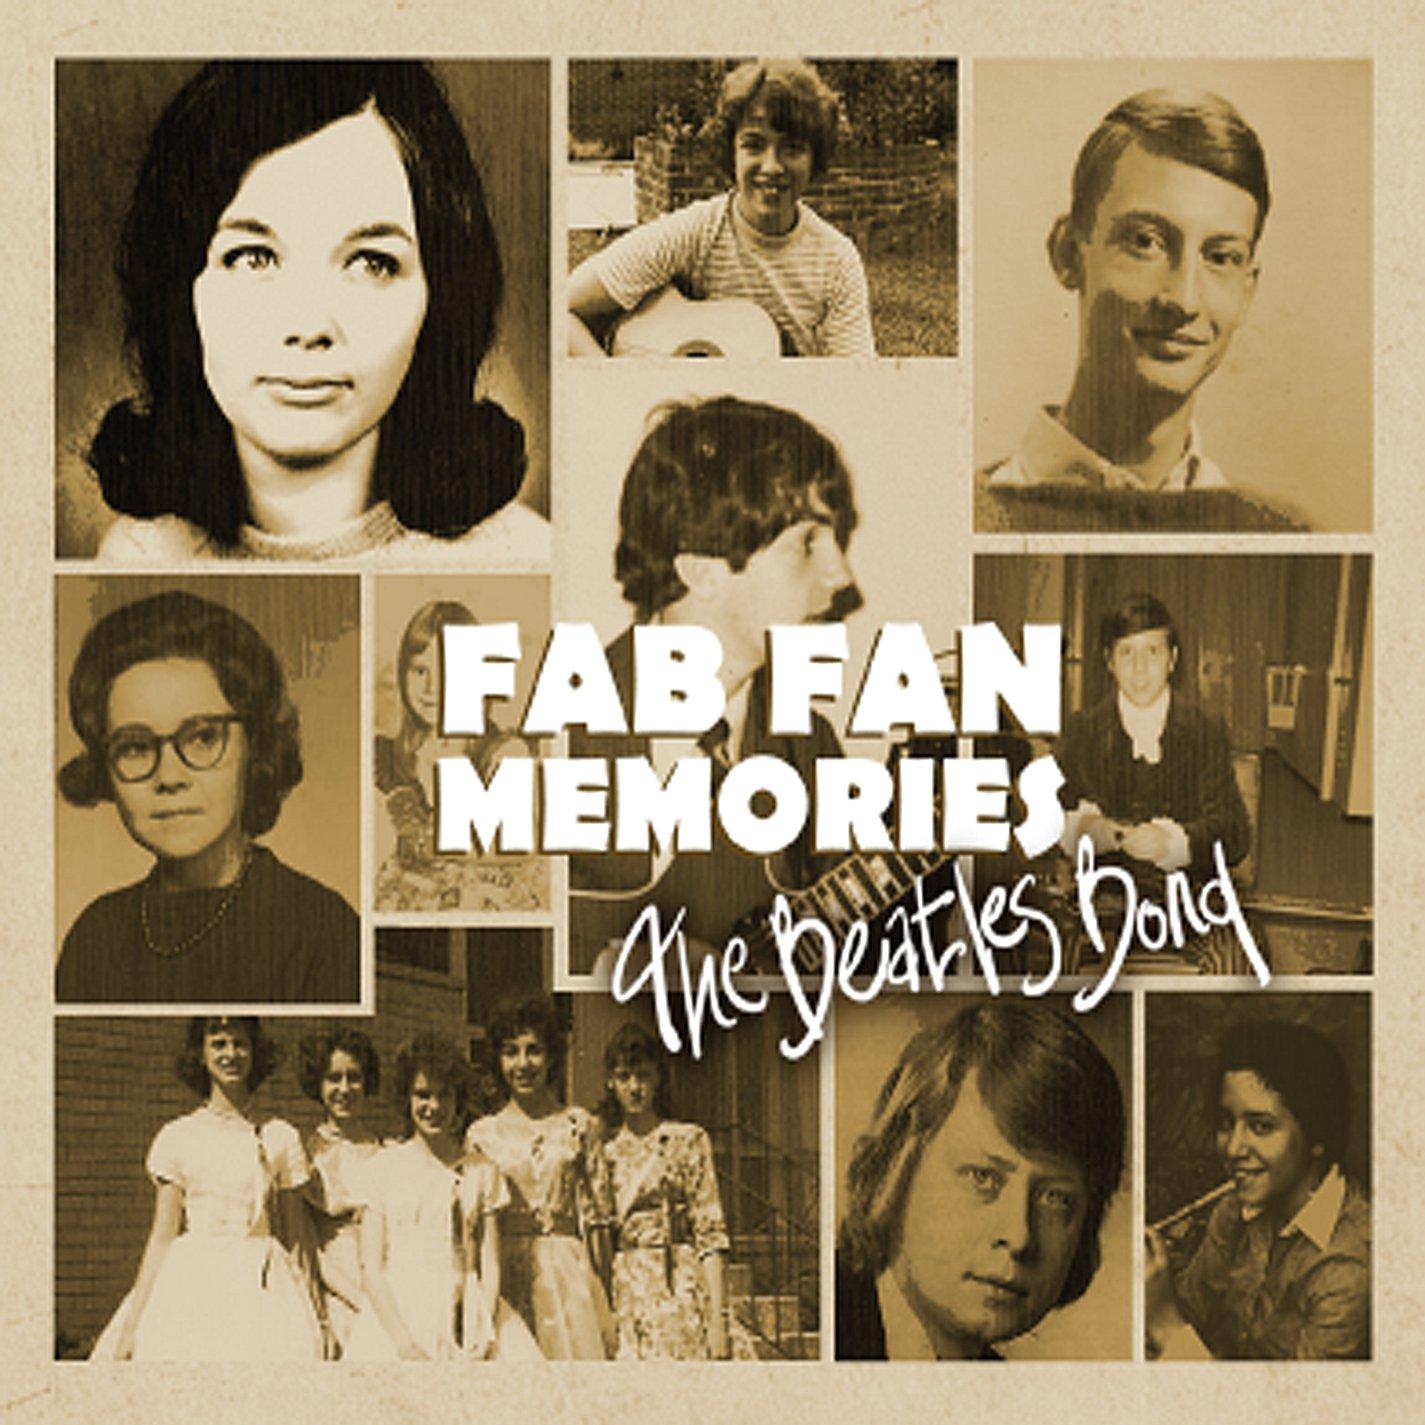 Fab Fan Memories the Beatles Bond